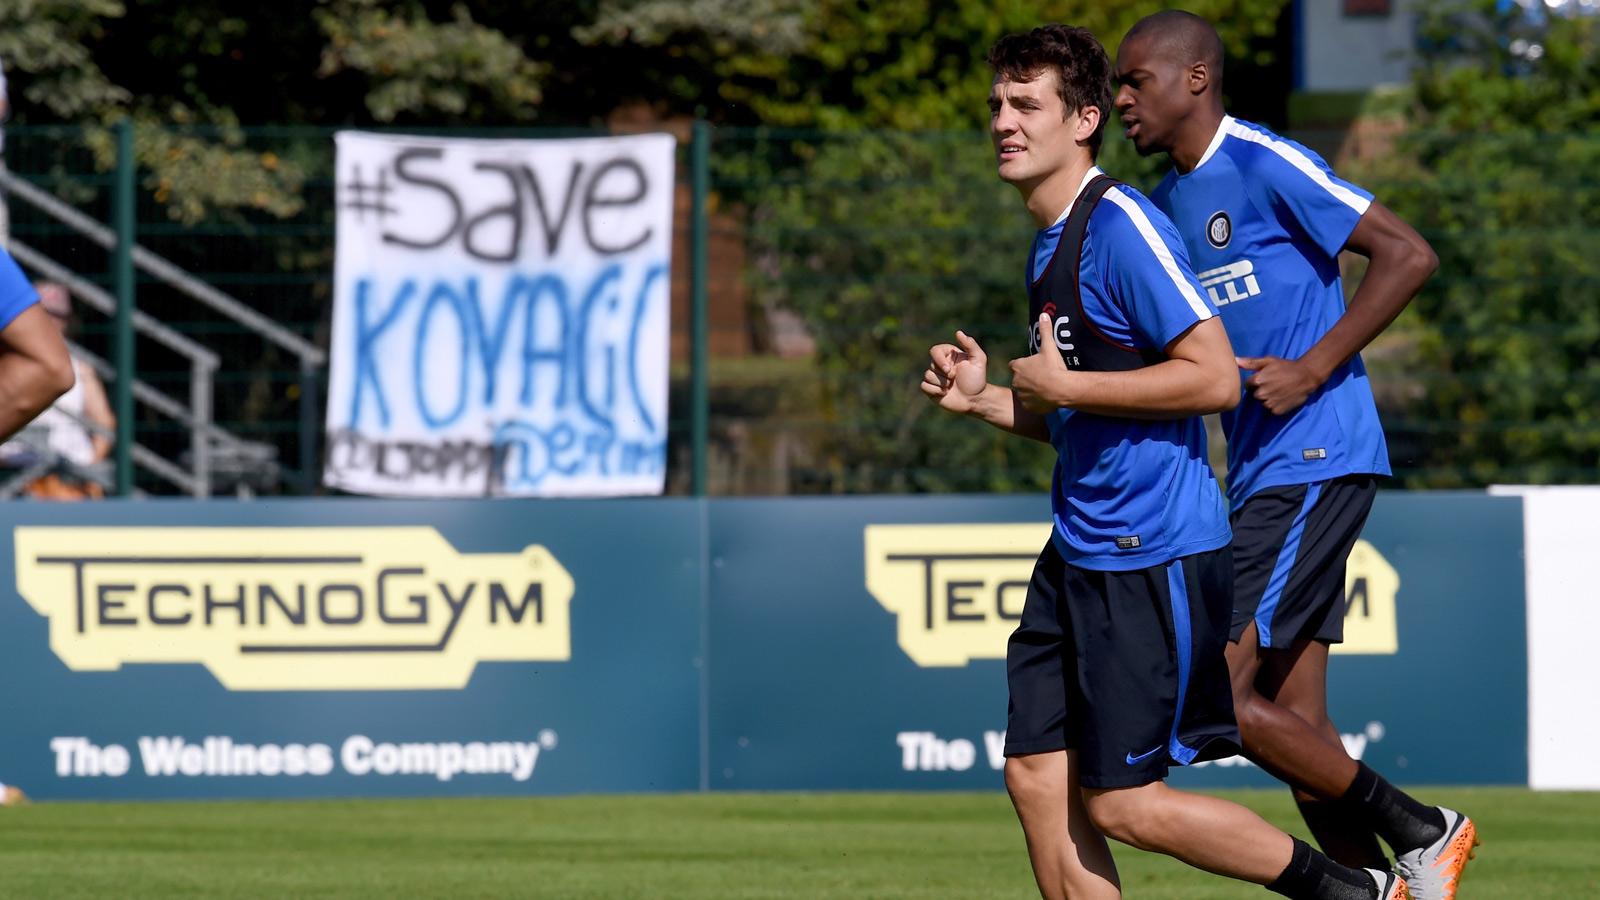 Inter Milan star Kovacic quashes Liverpool speculation